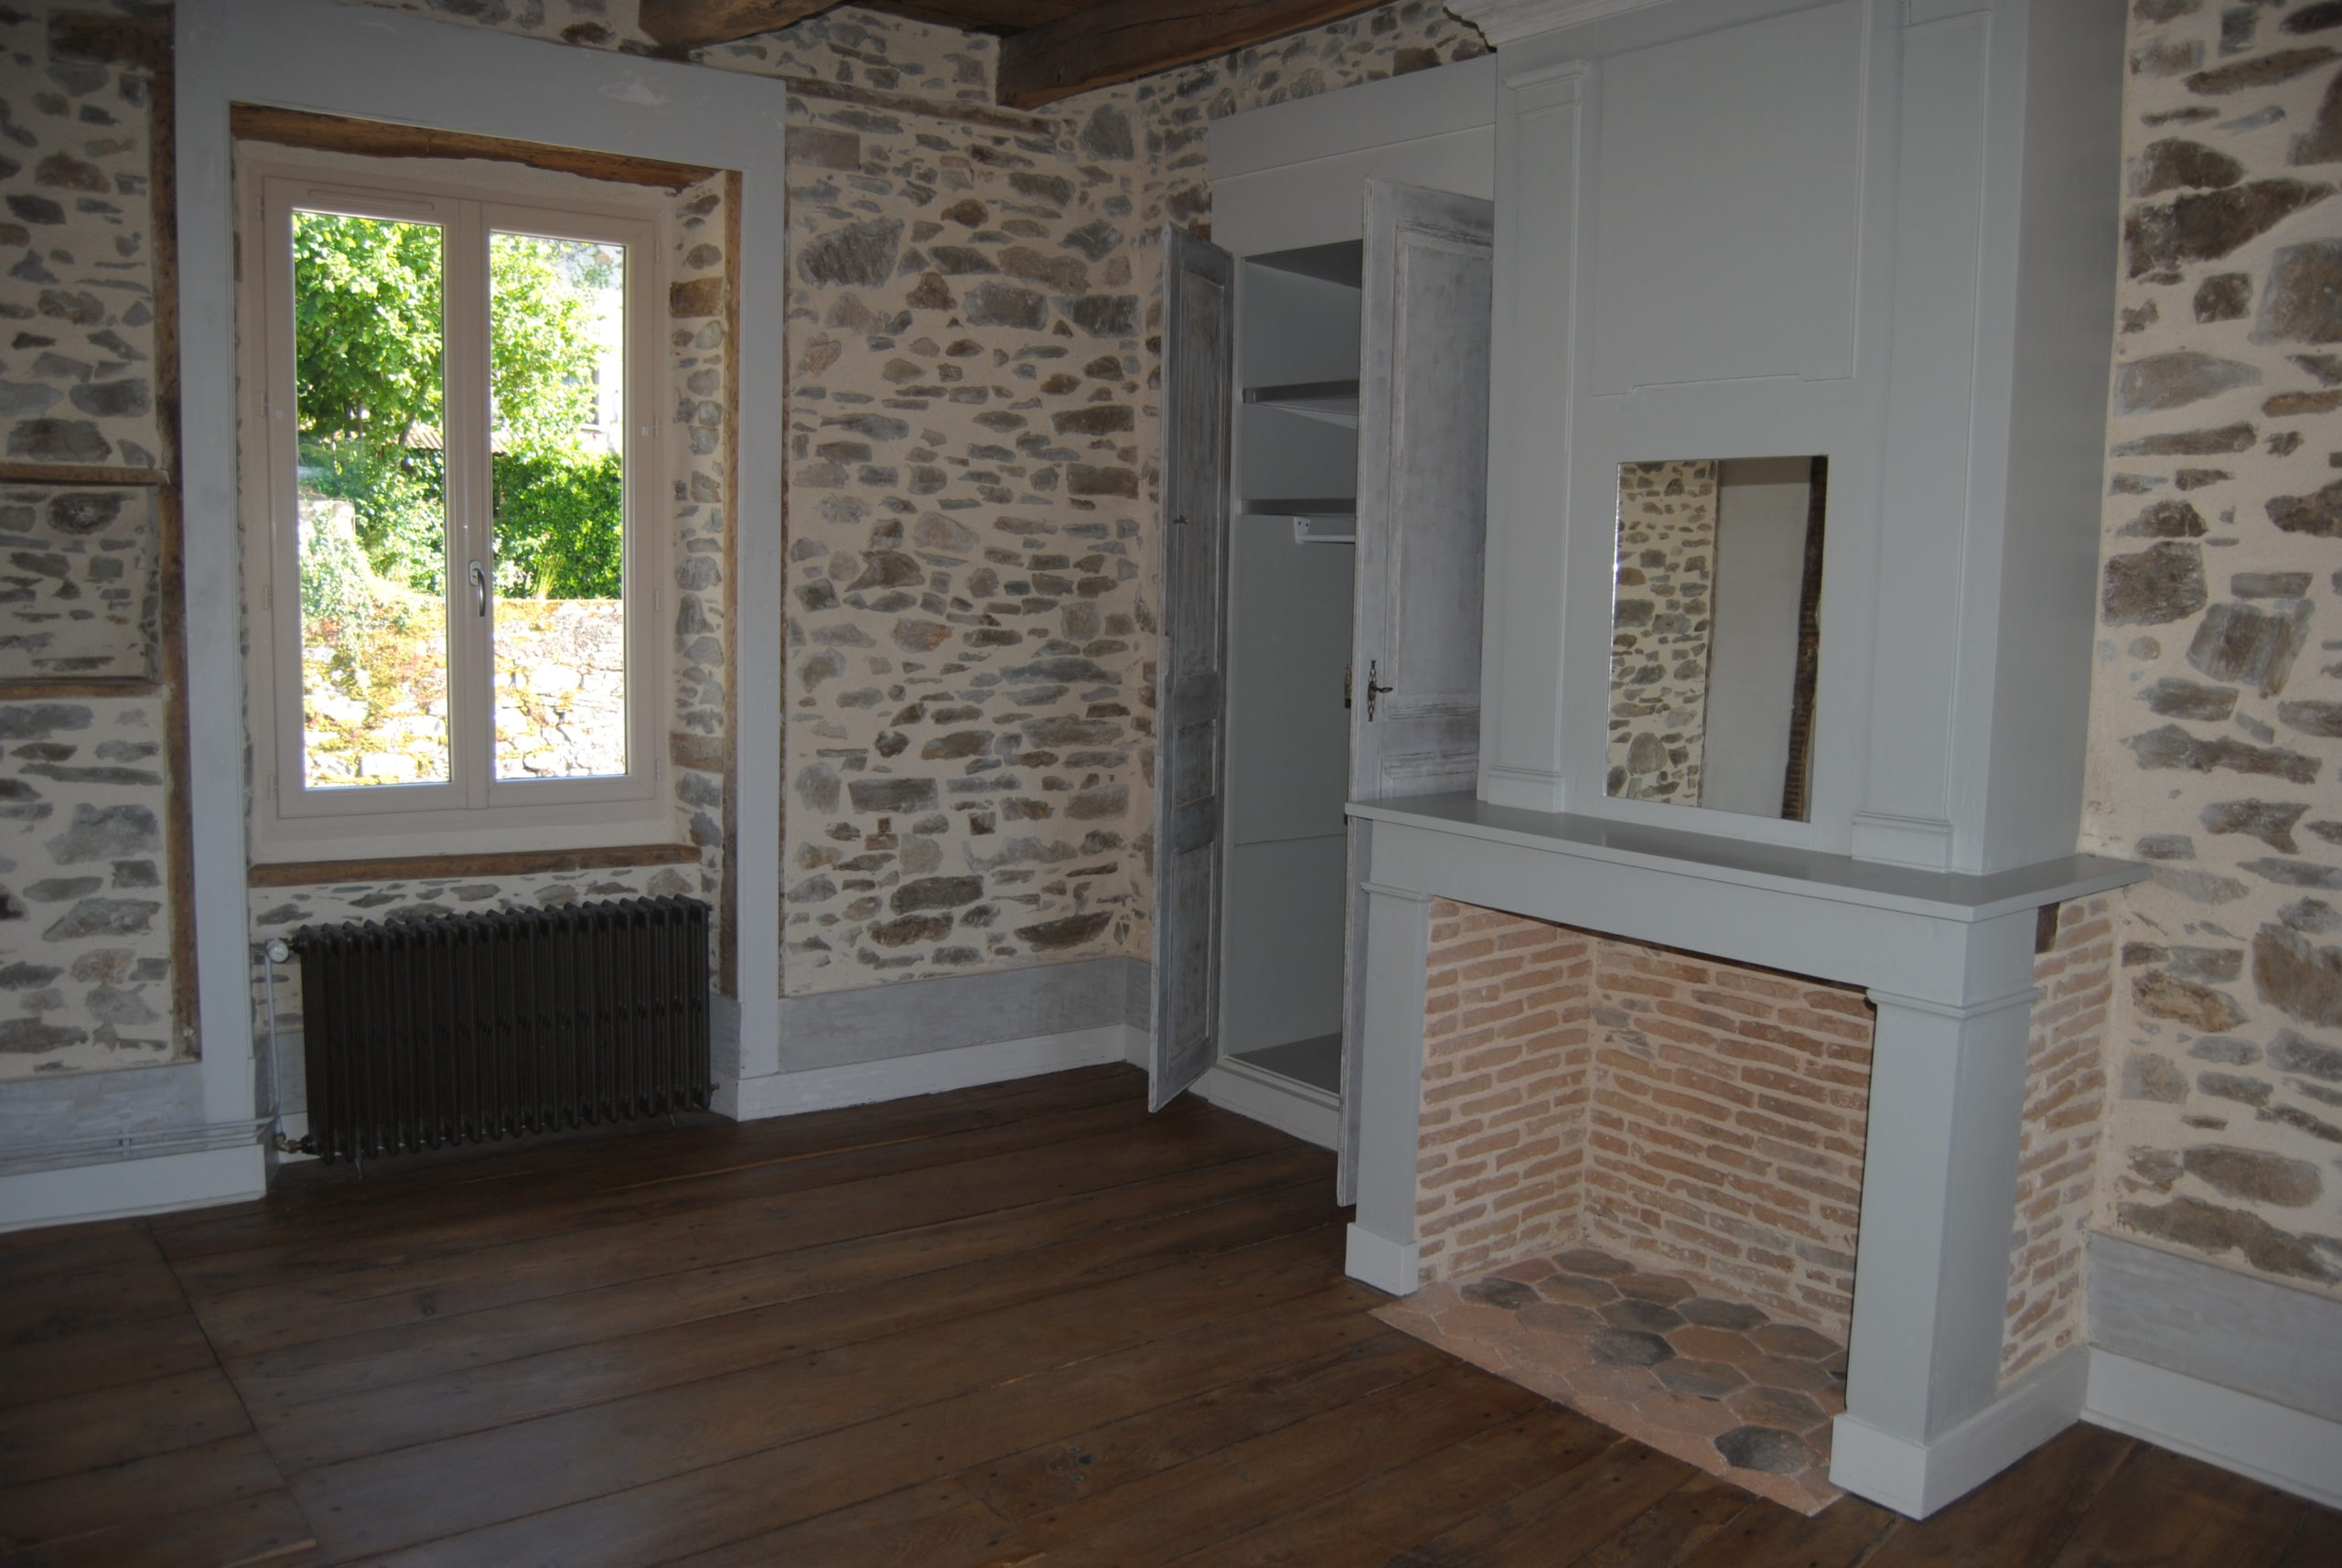 PIERRE-BUFFIERE – Maison 3 chambres